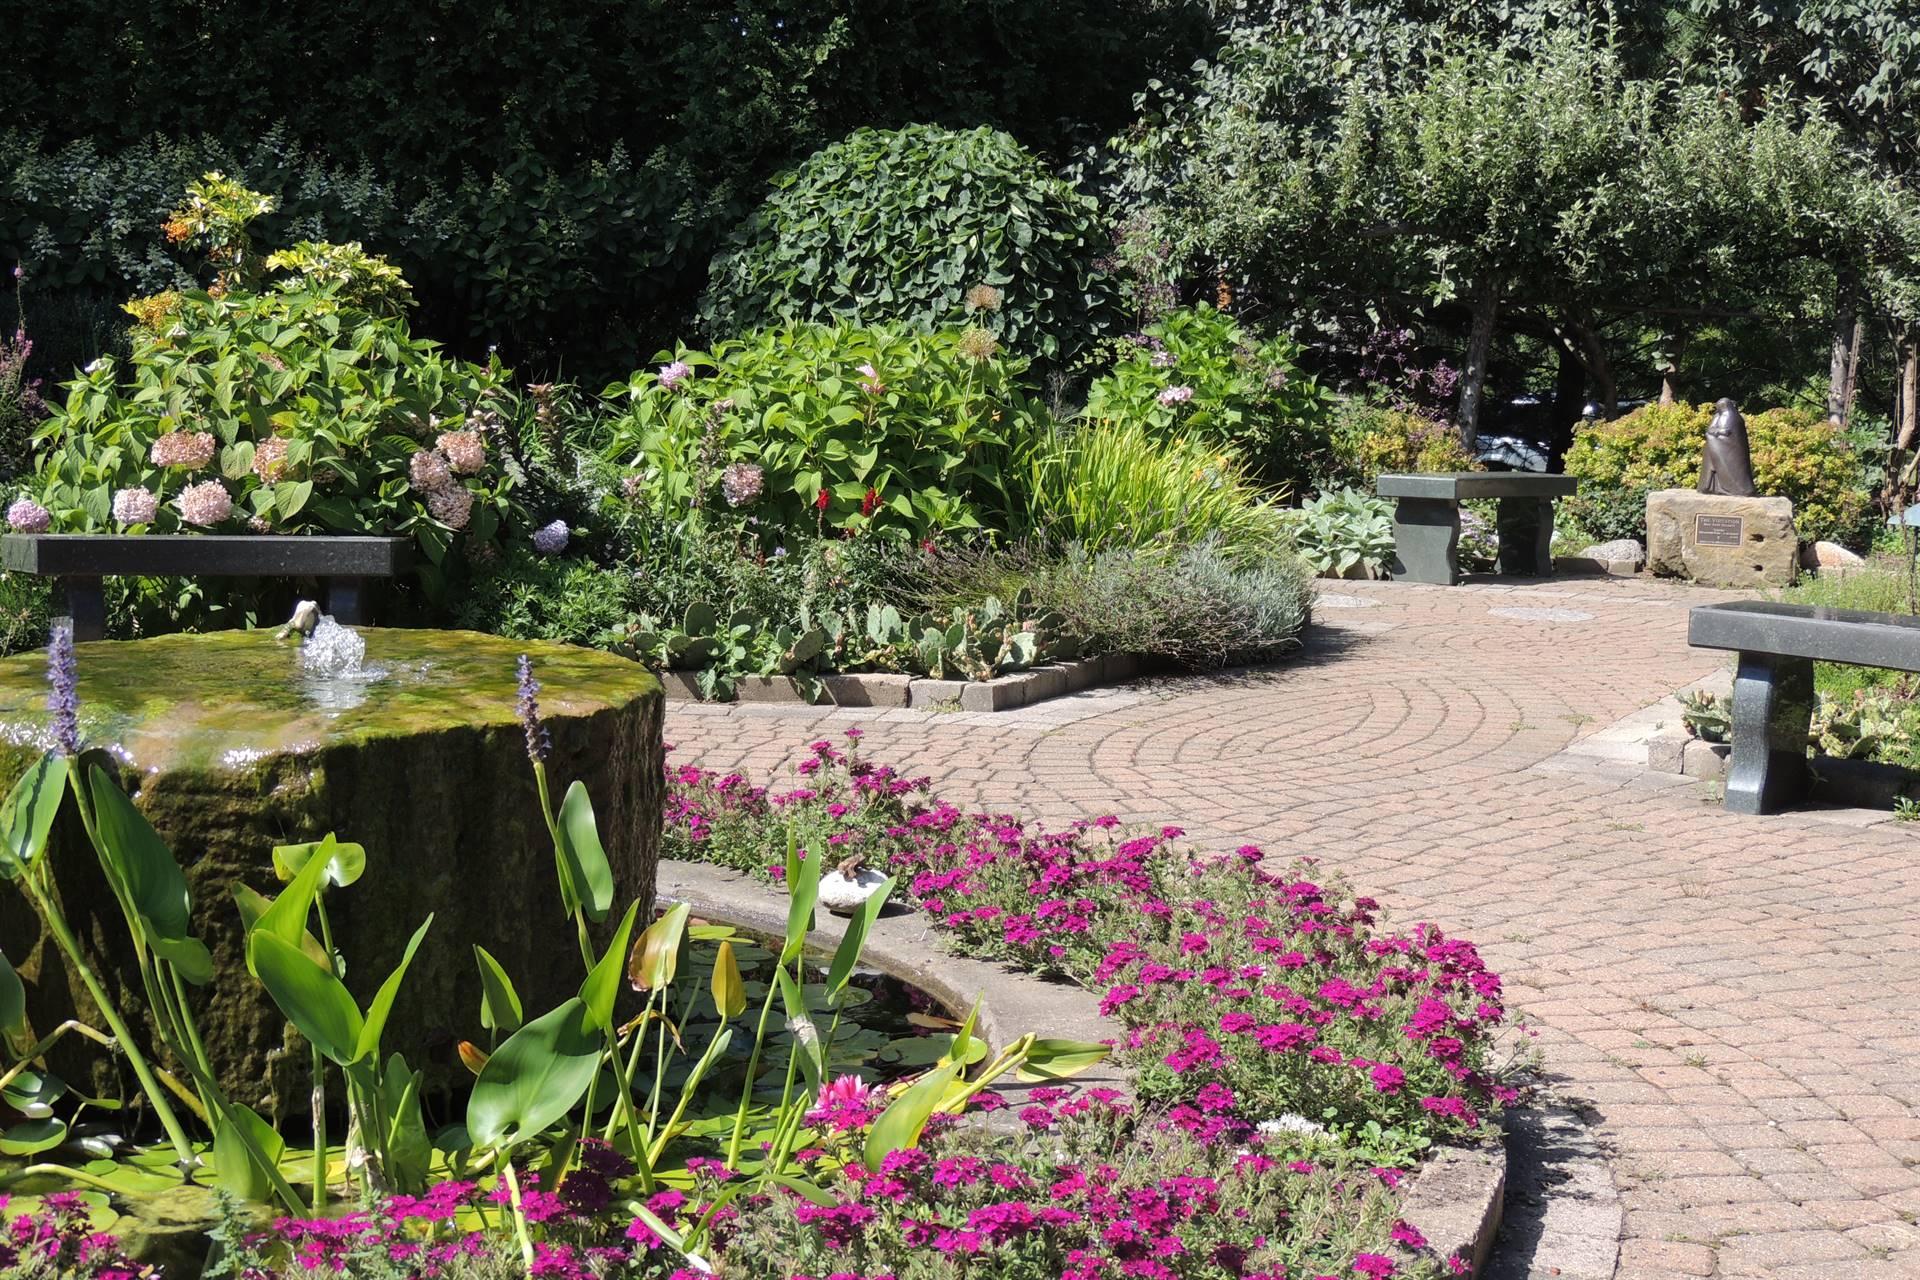 Garden of Life Fountain and walkway